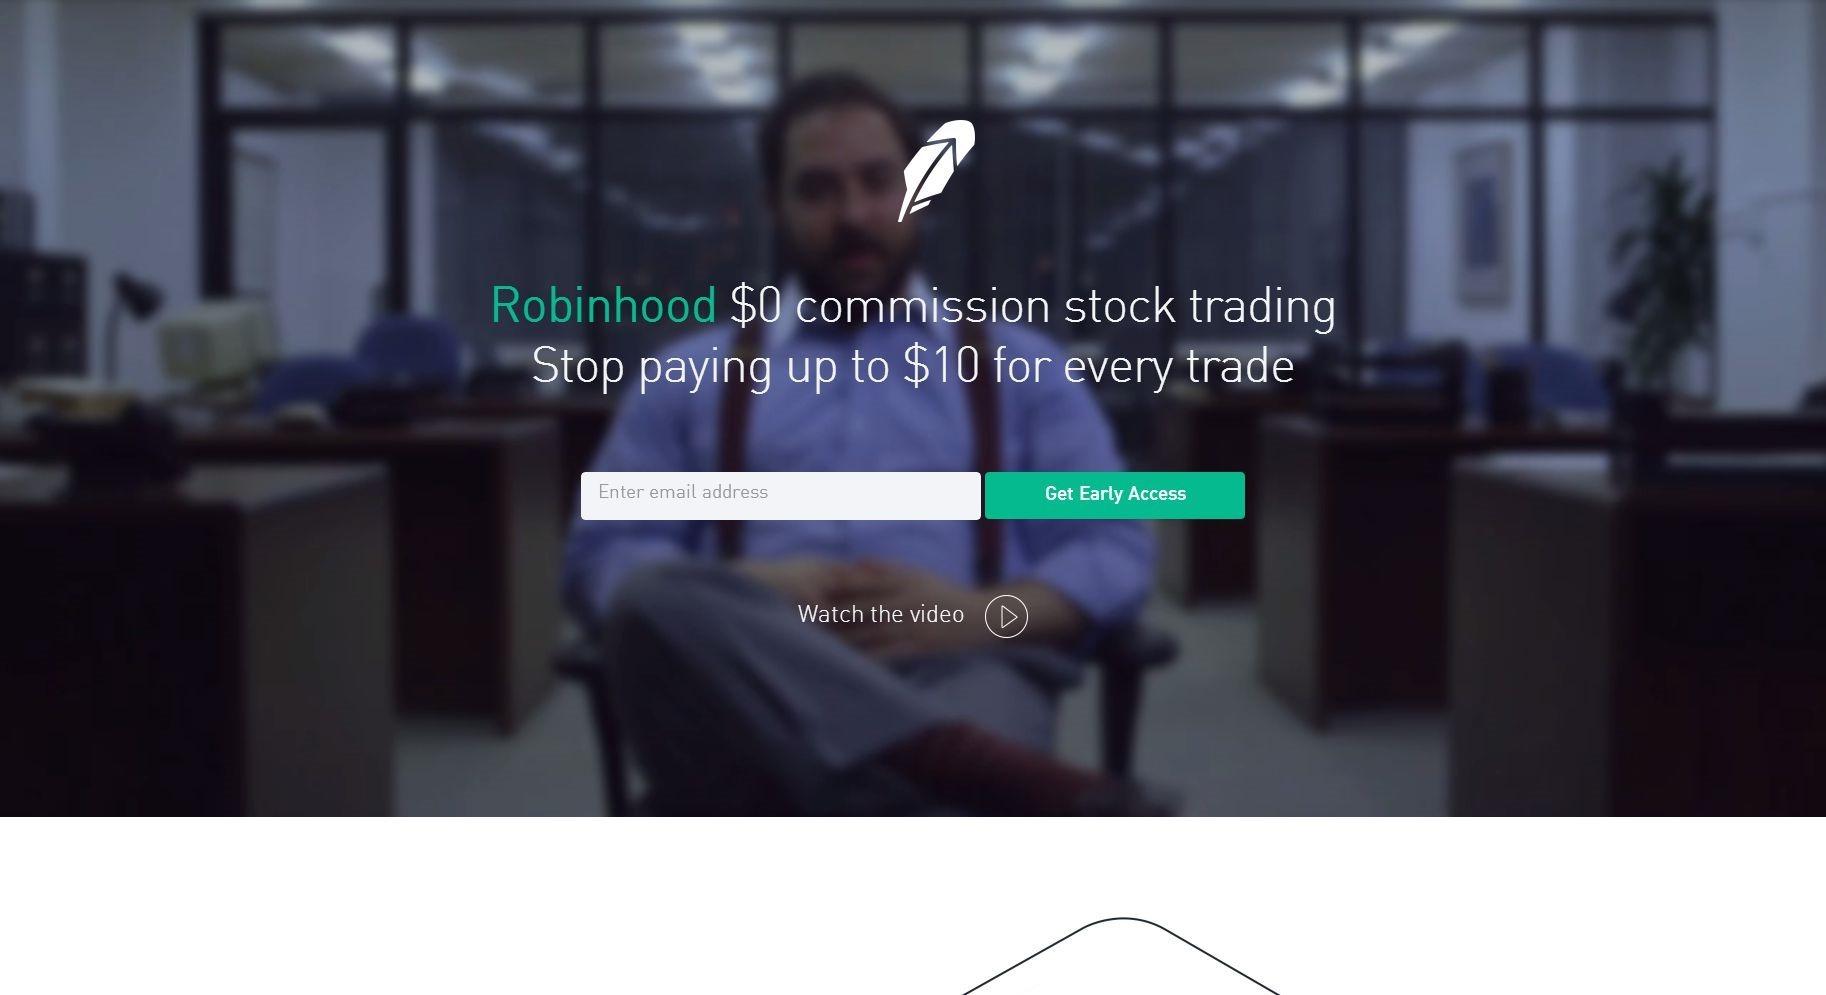 www_robinhood_com